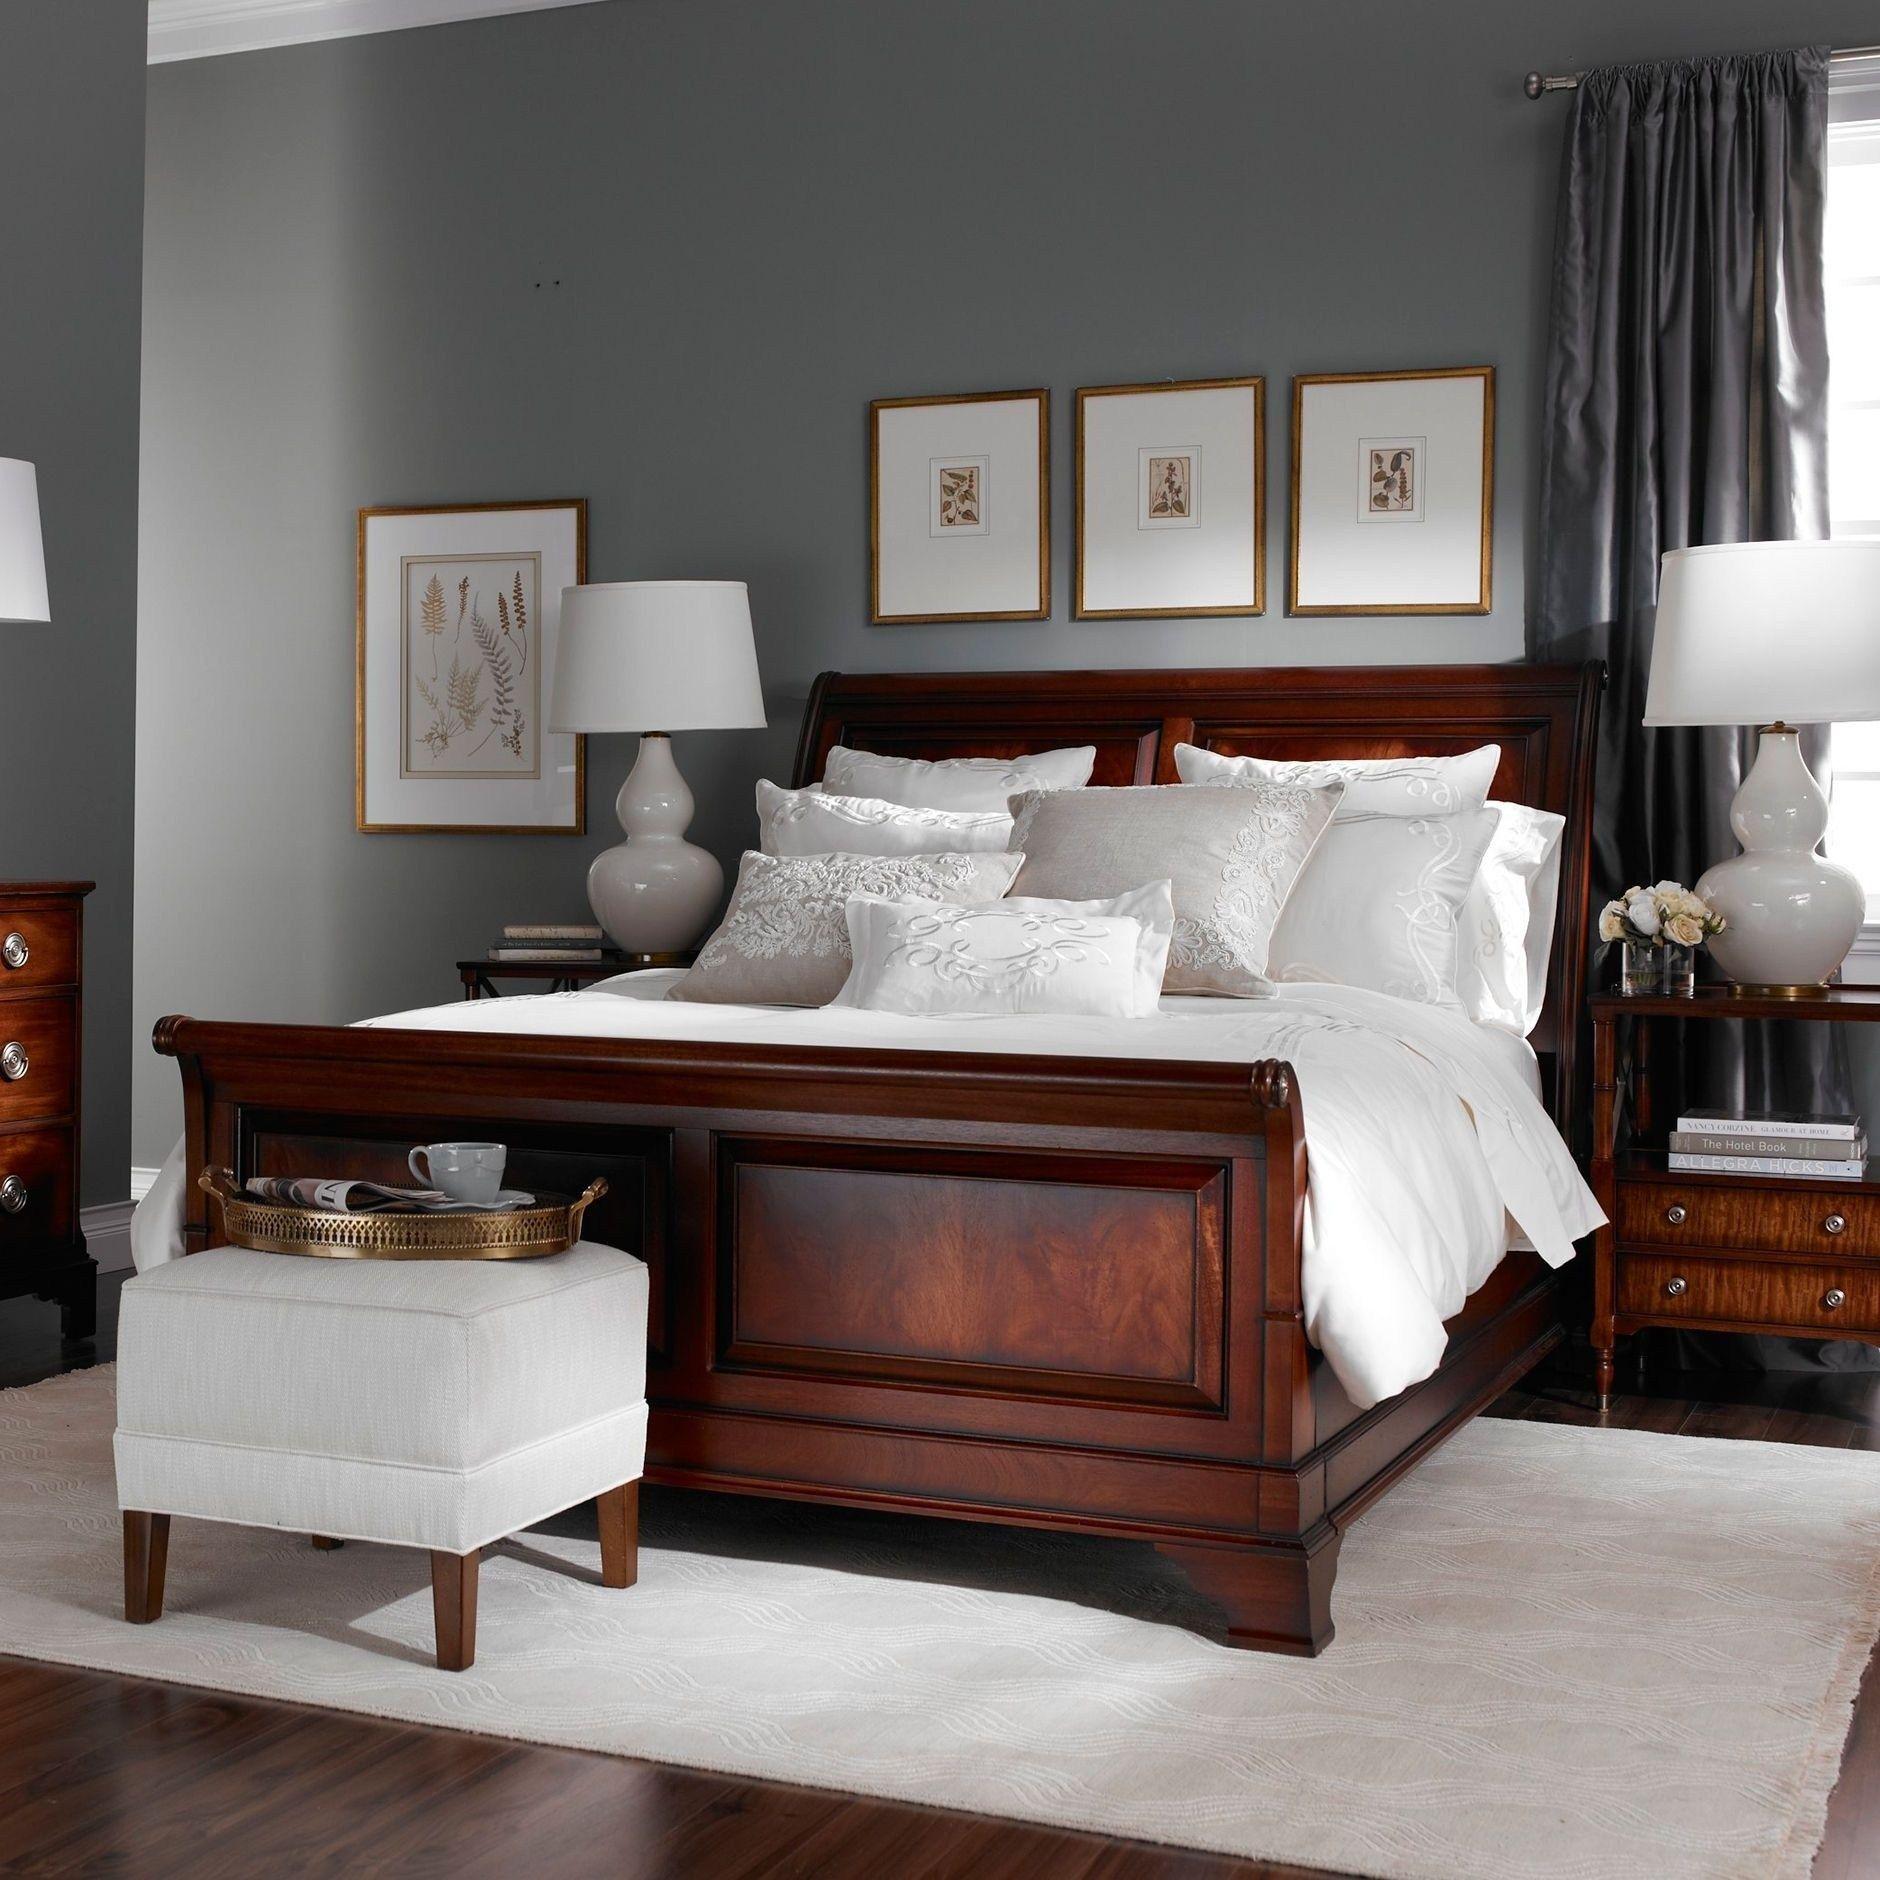 8+ Popular Bedroom Decorating Ideas With Dark Wood Furniture